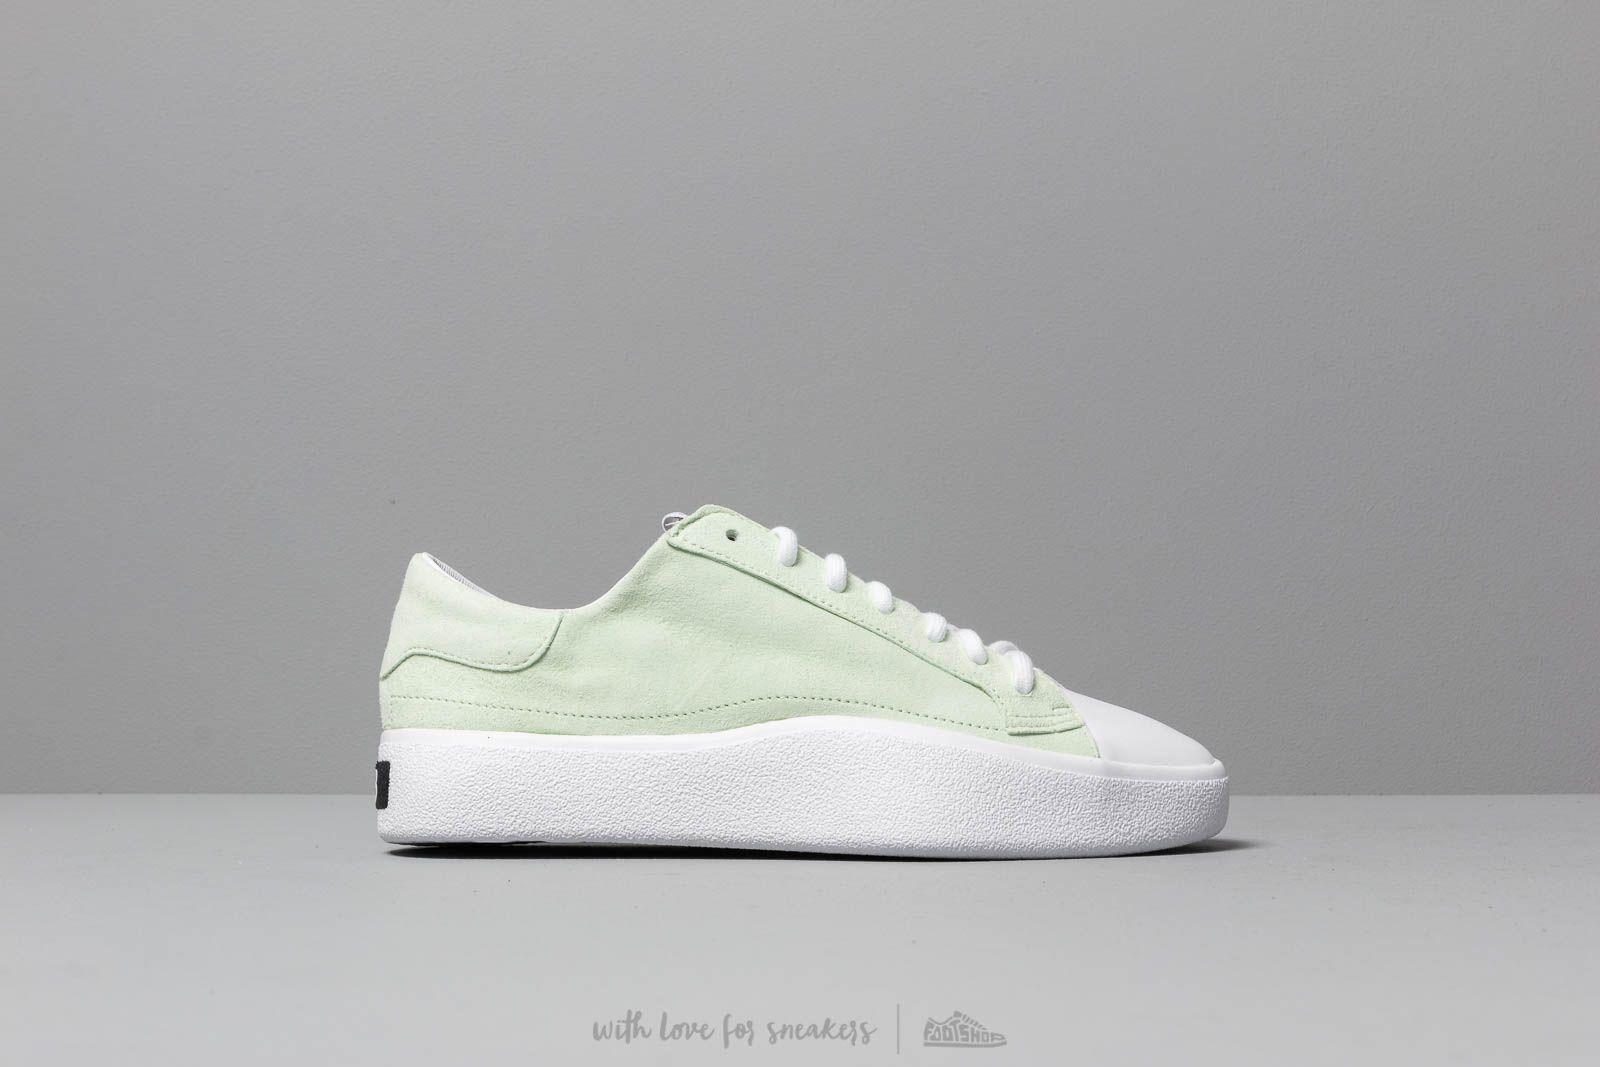 706c1a556 Lyst - Y-3 Tangatsu Lace Aero Green  Ftwr White  Black in White for Men